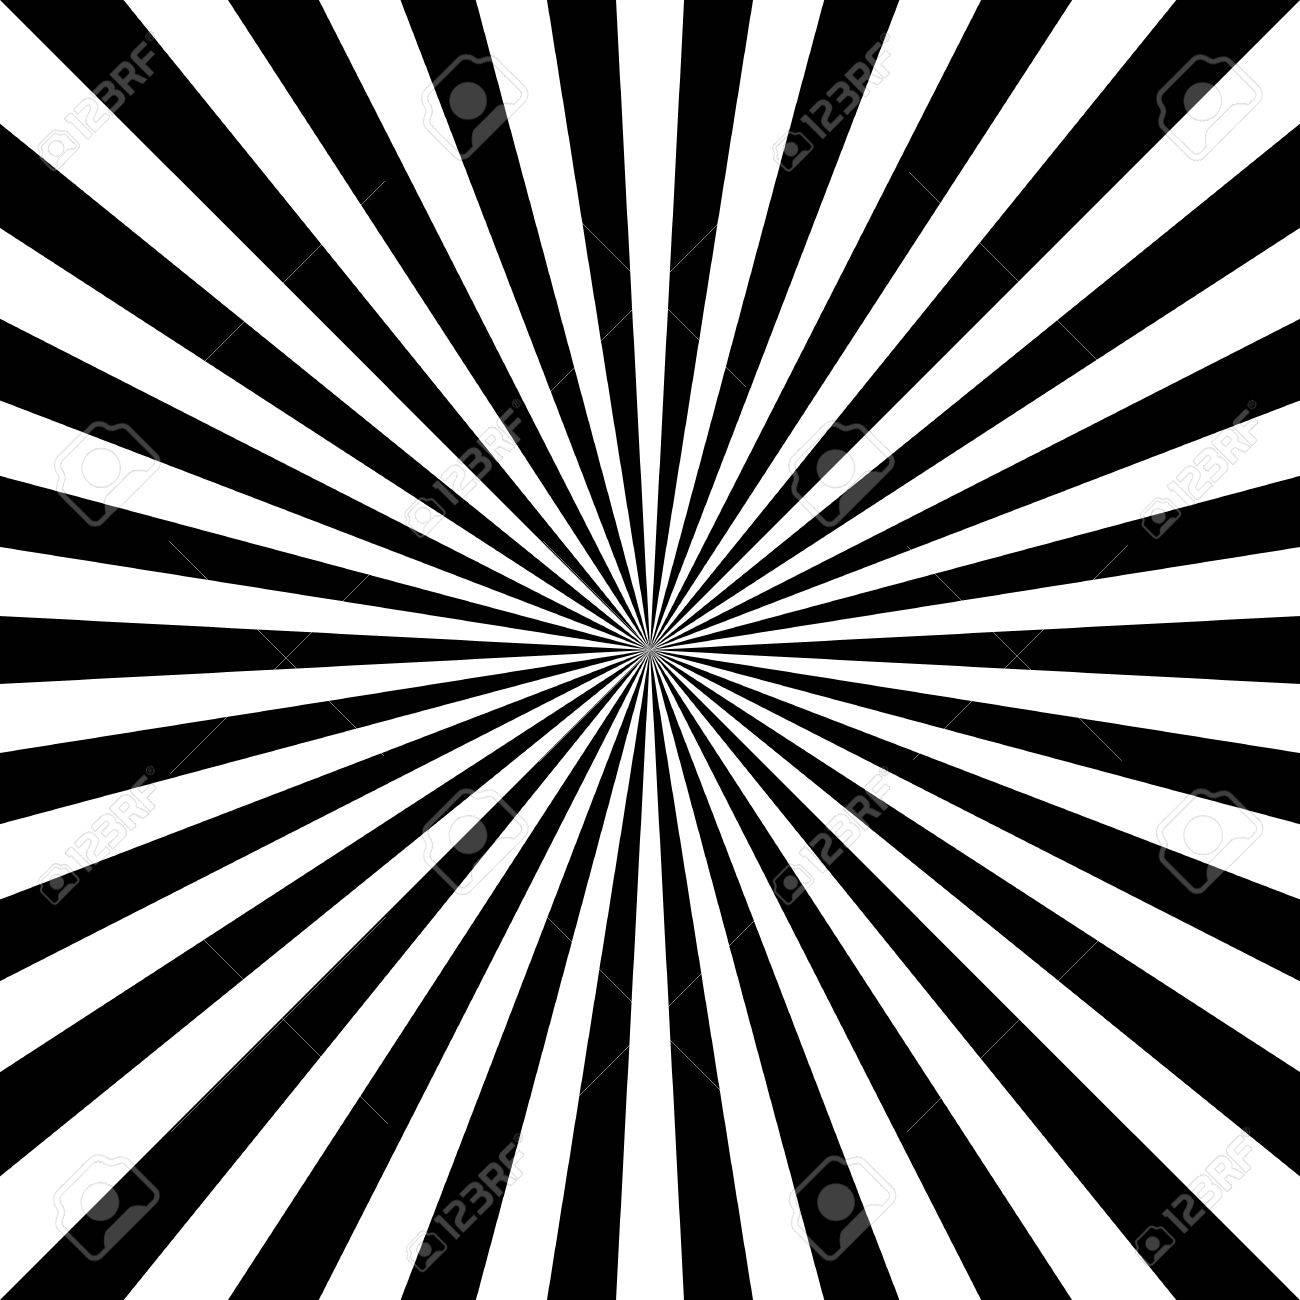 03e9548204e Sun rays, sunburst, light rays, sunbeam background abstract black..